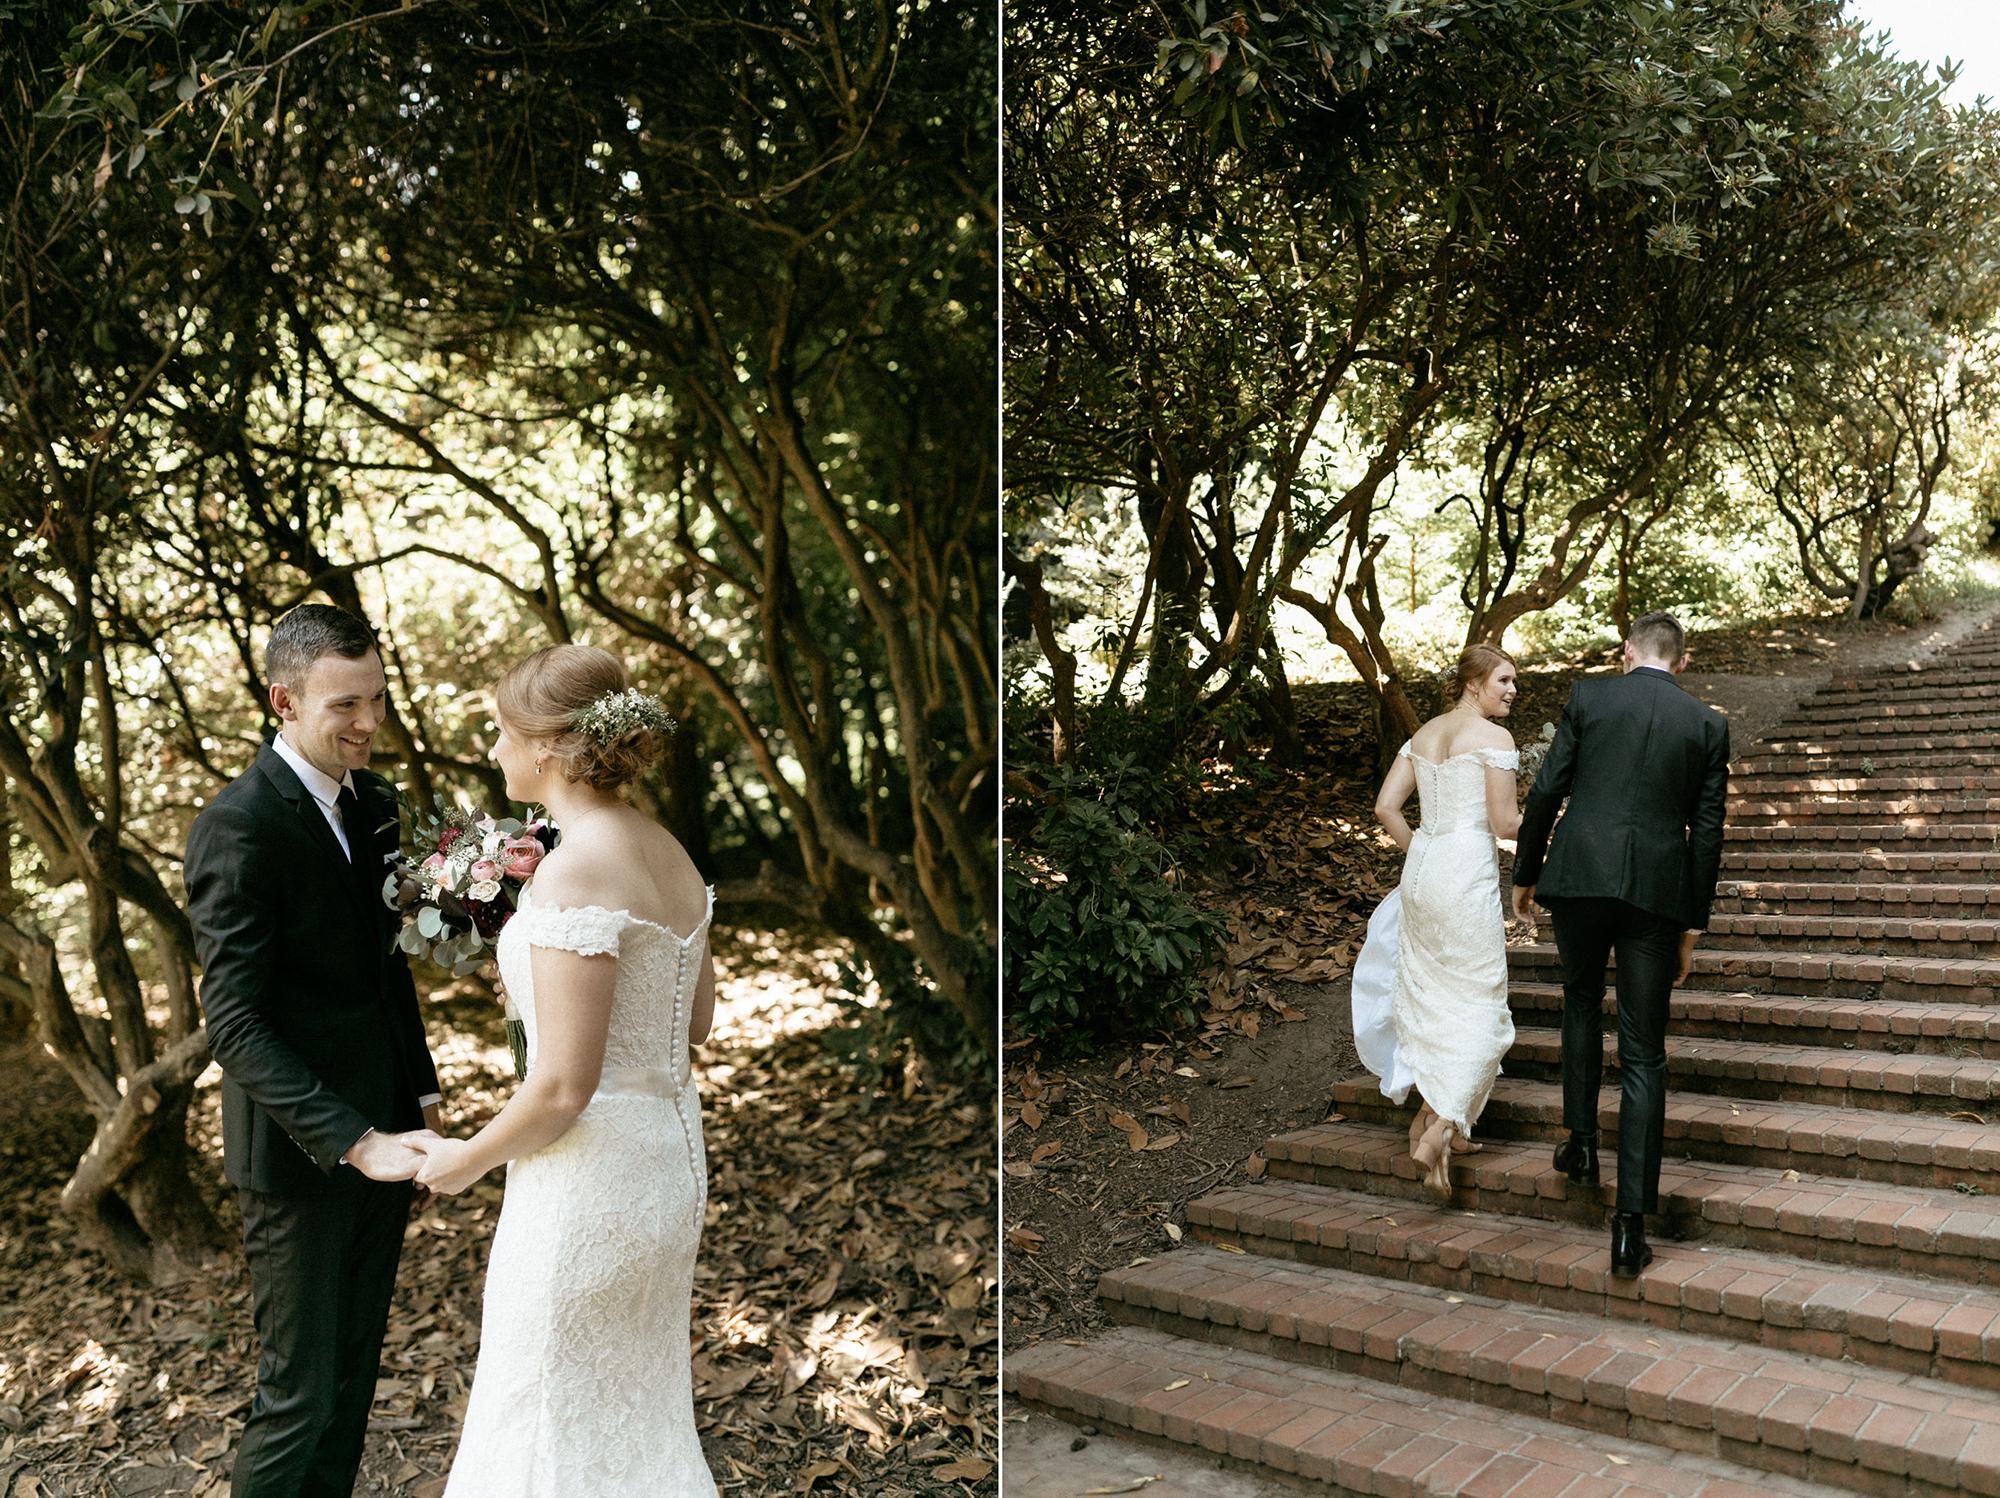 the_evergreen_portland_wedding-19.jpg